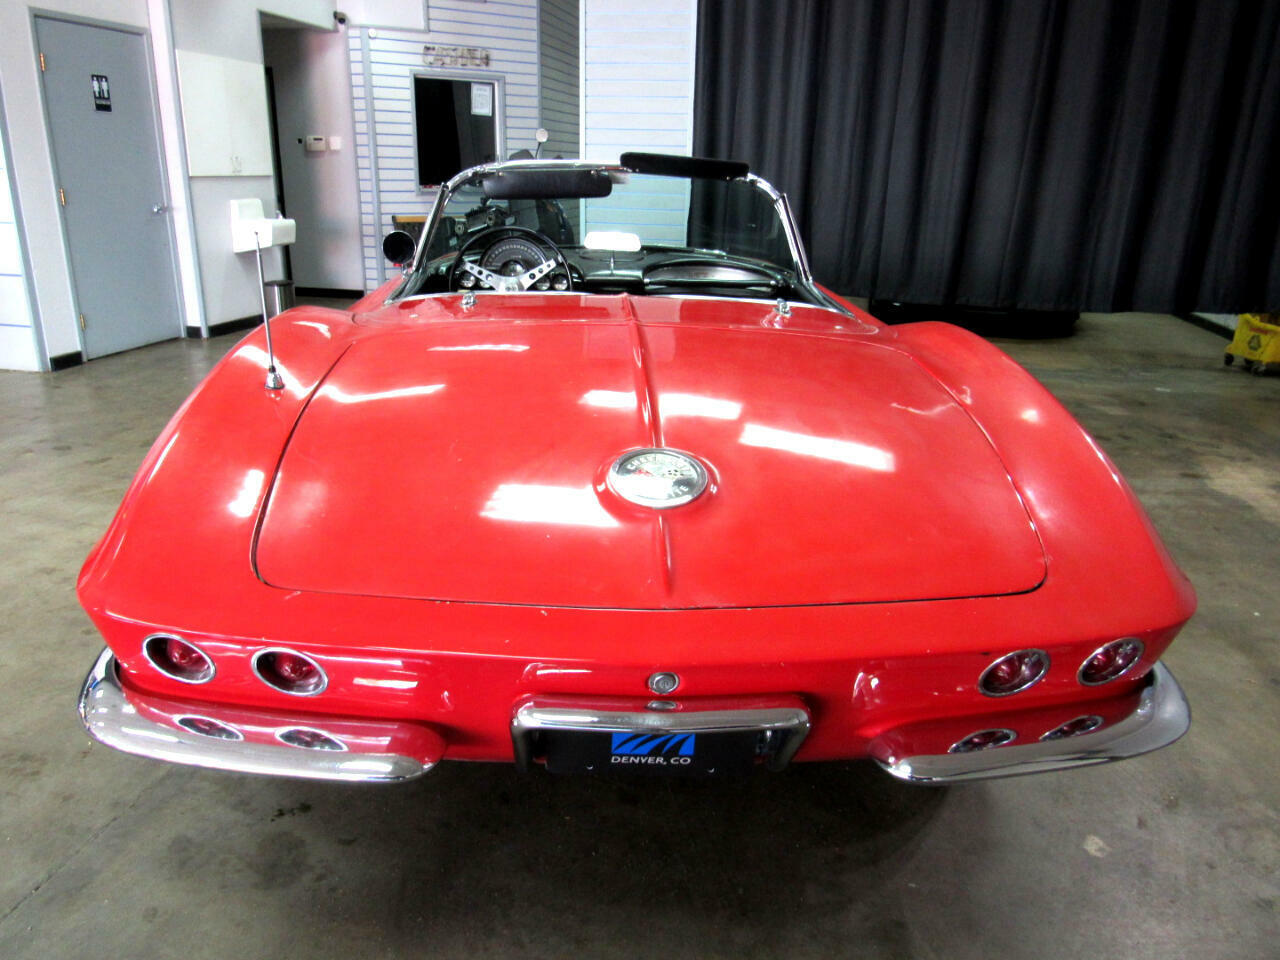 1962 Red Chevrolet Corvette Convertible    C1 Corvette Photo 6